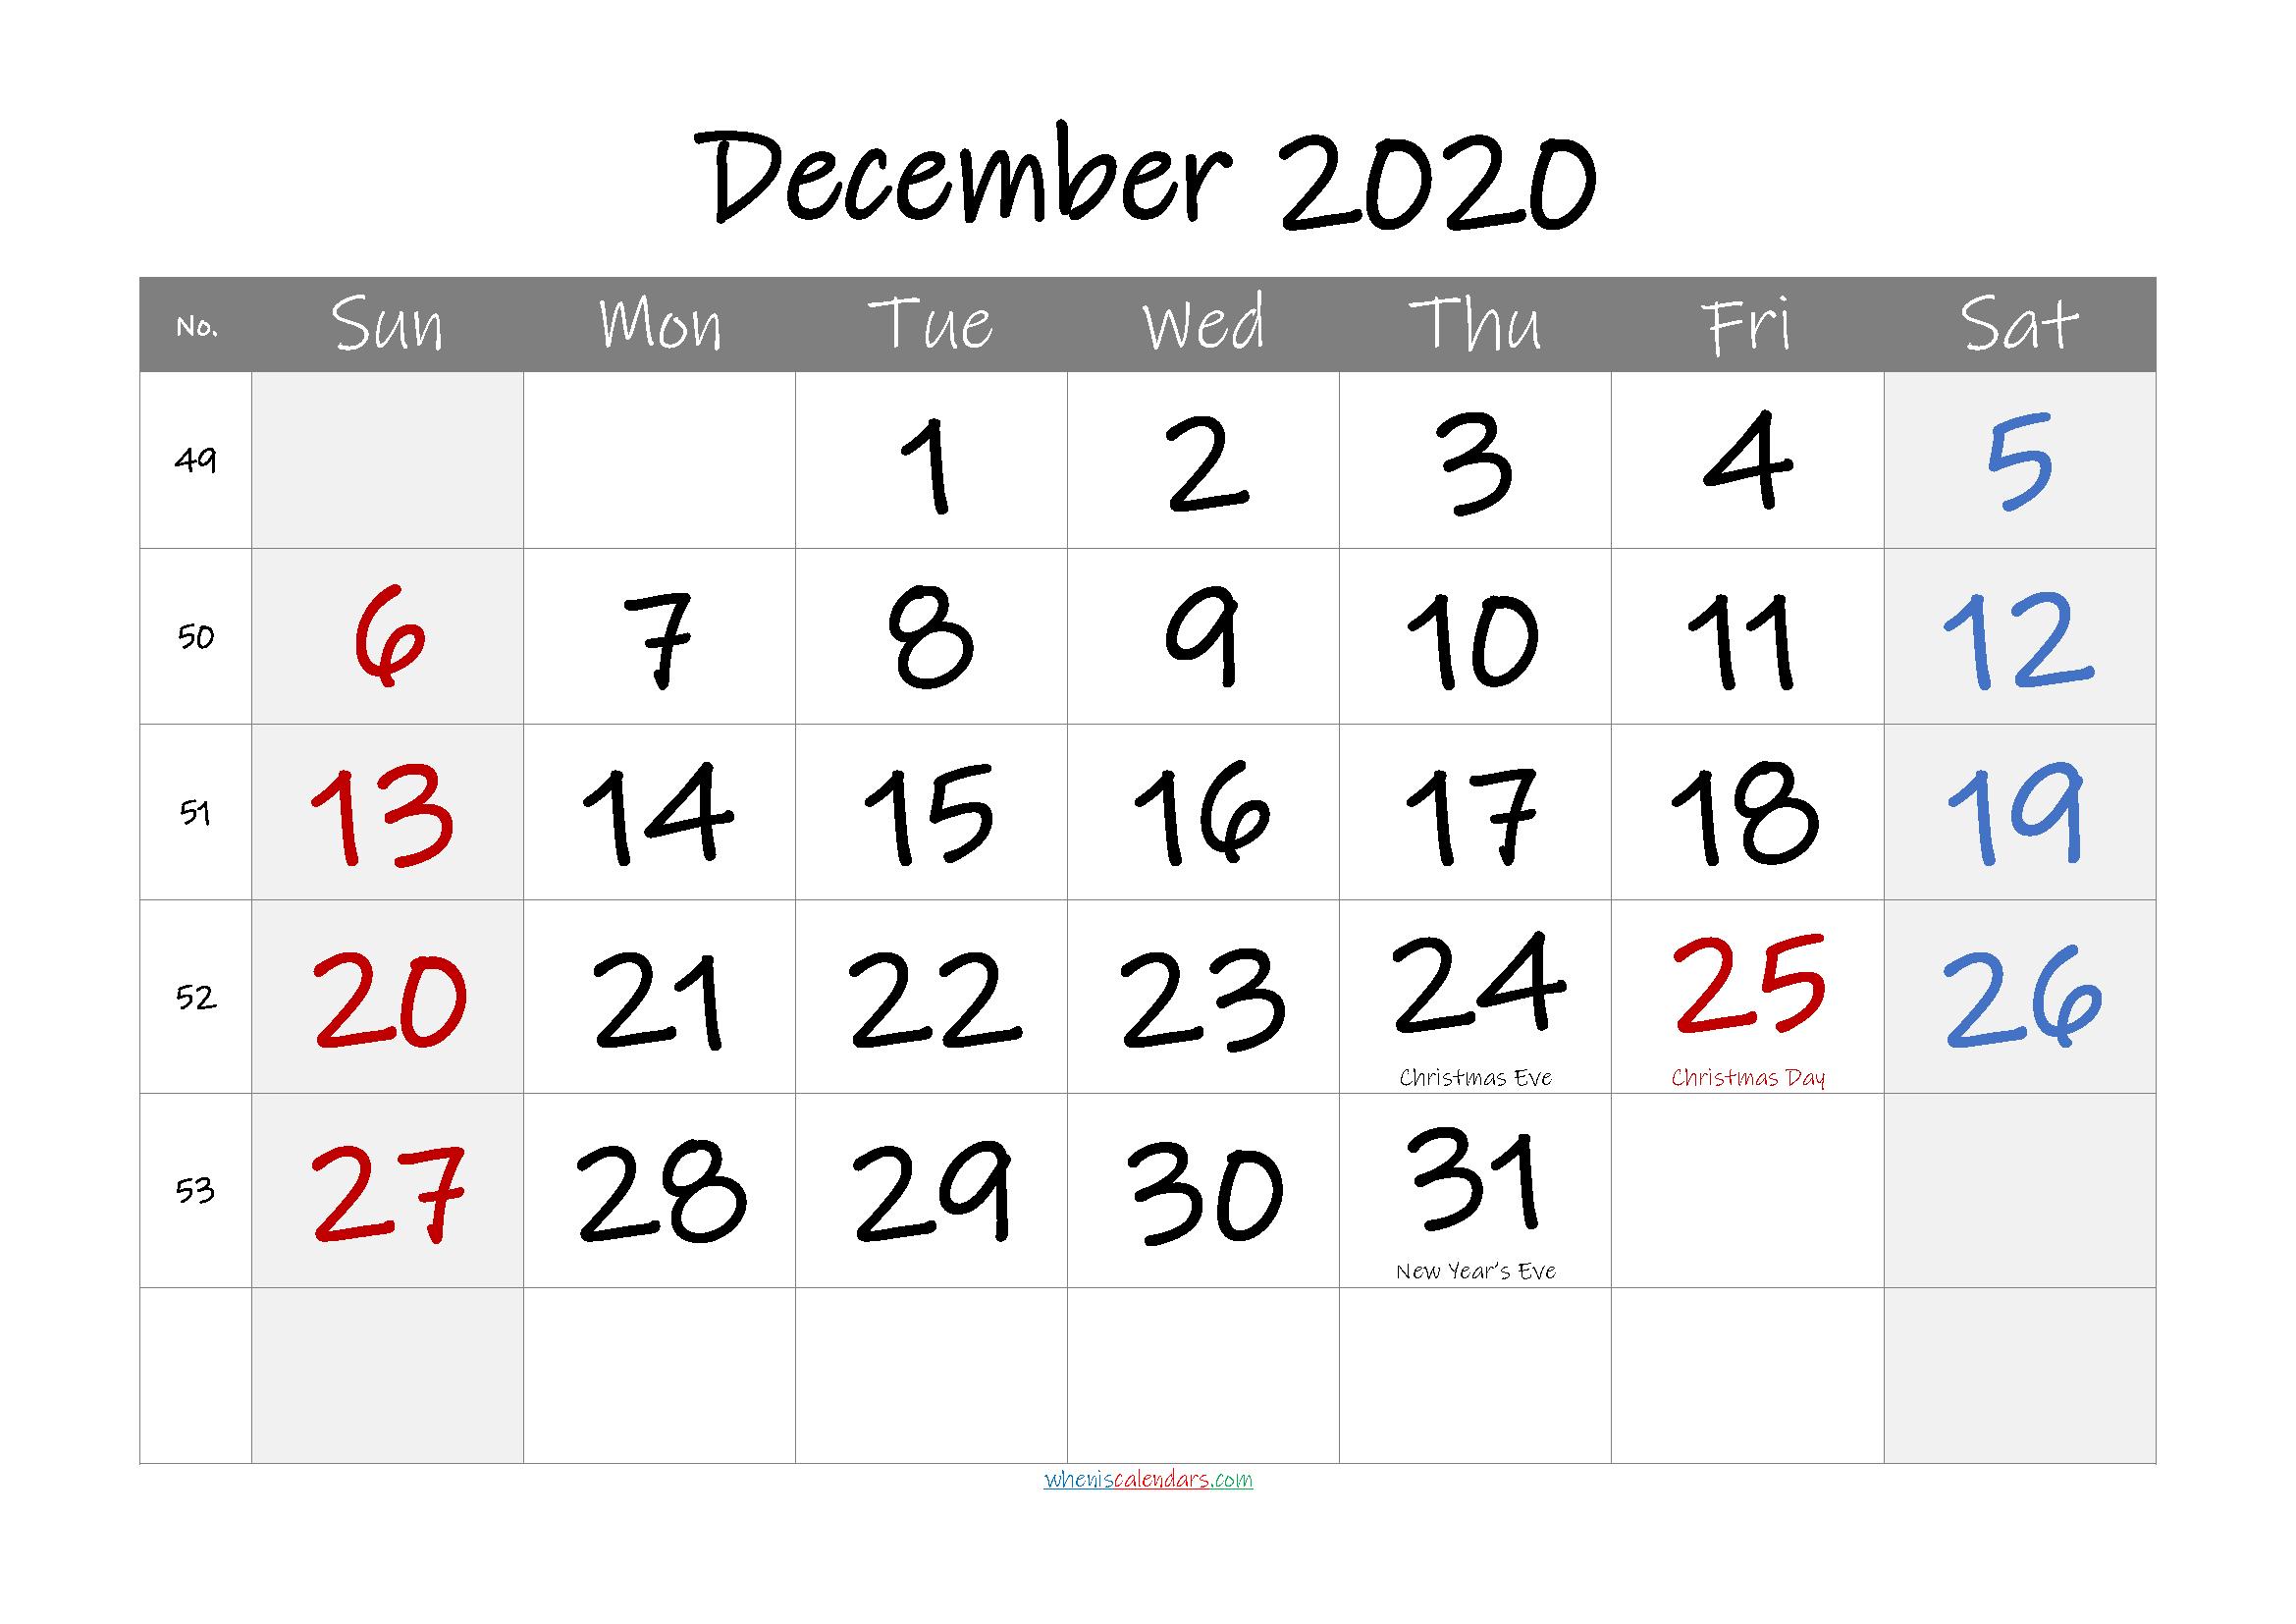 December 2020 Free Printable Calendar with Holidays